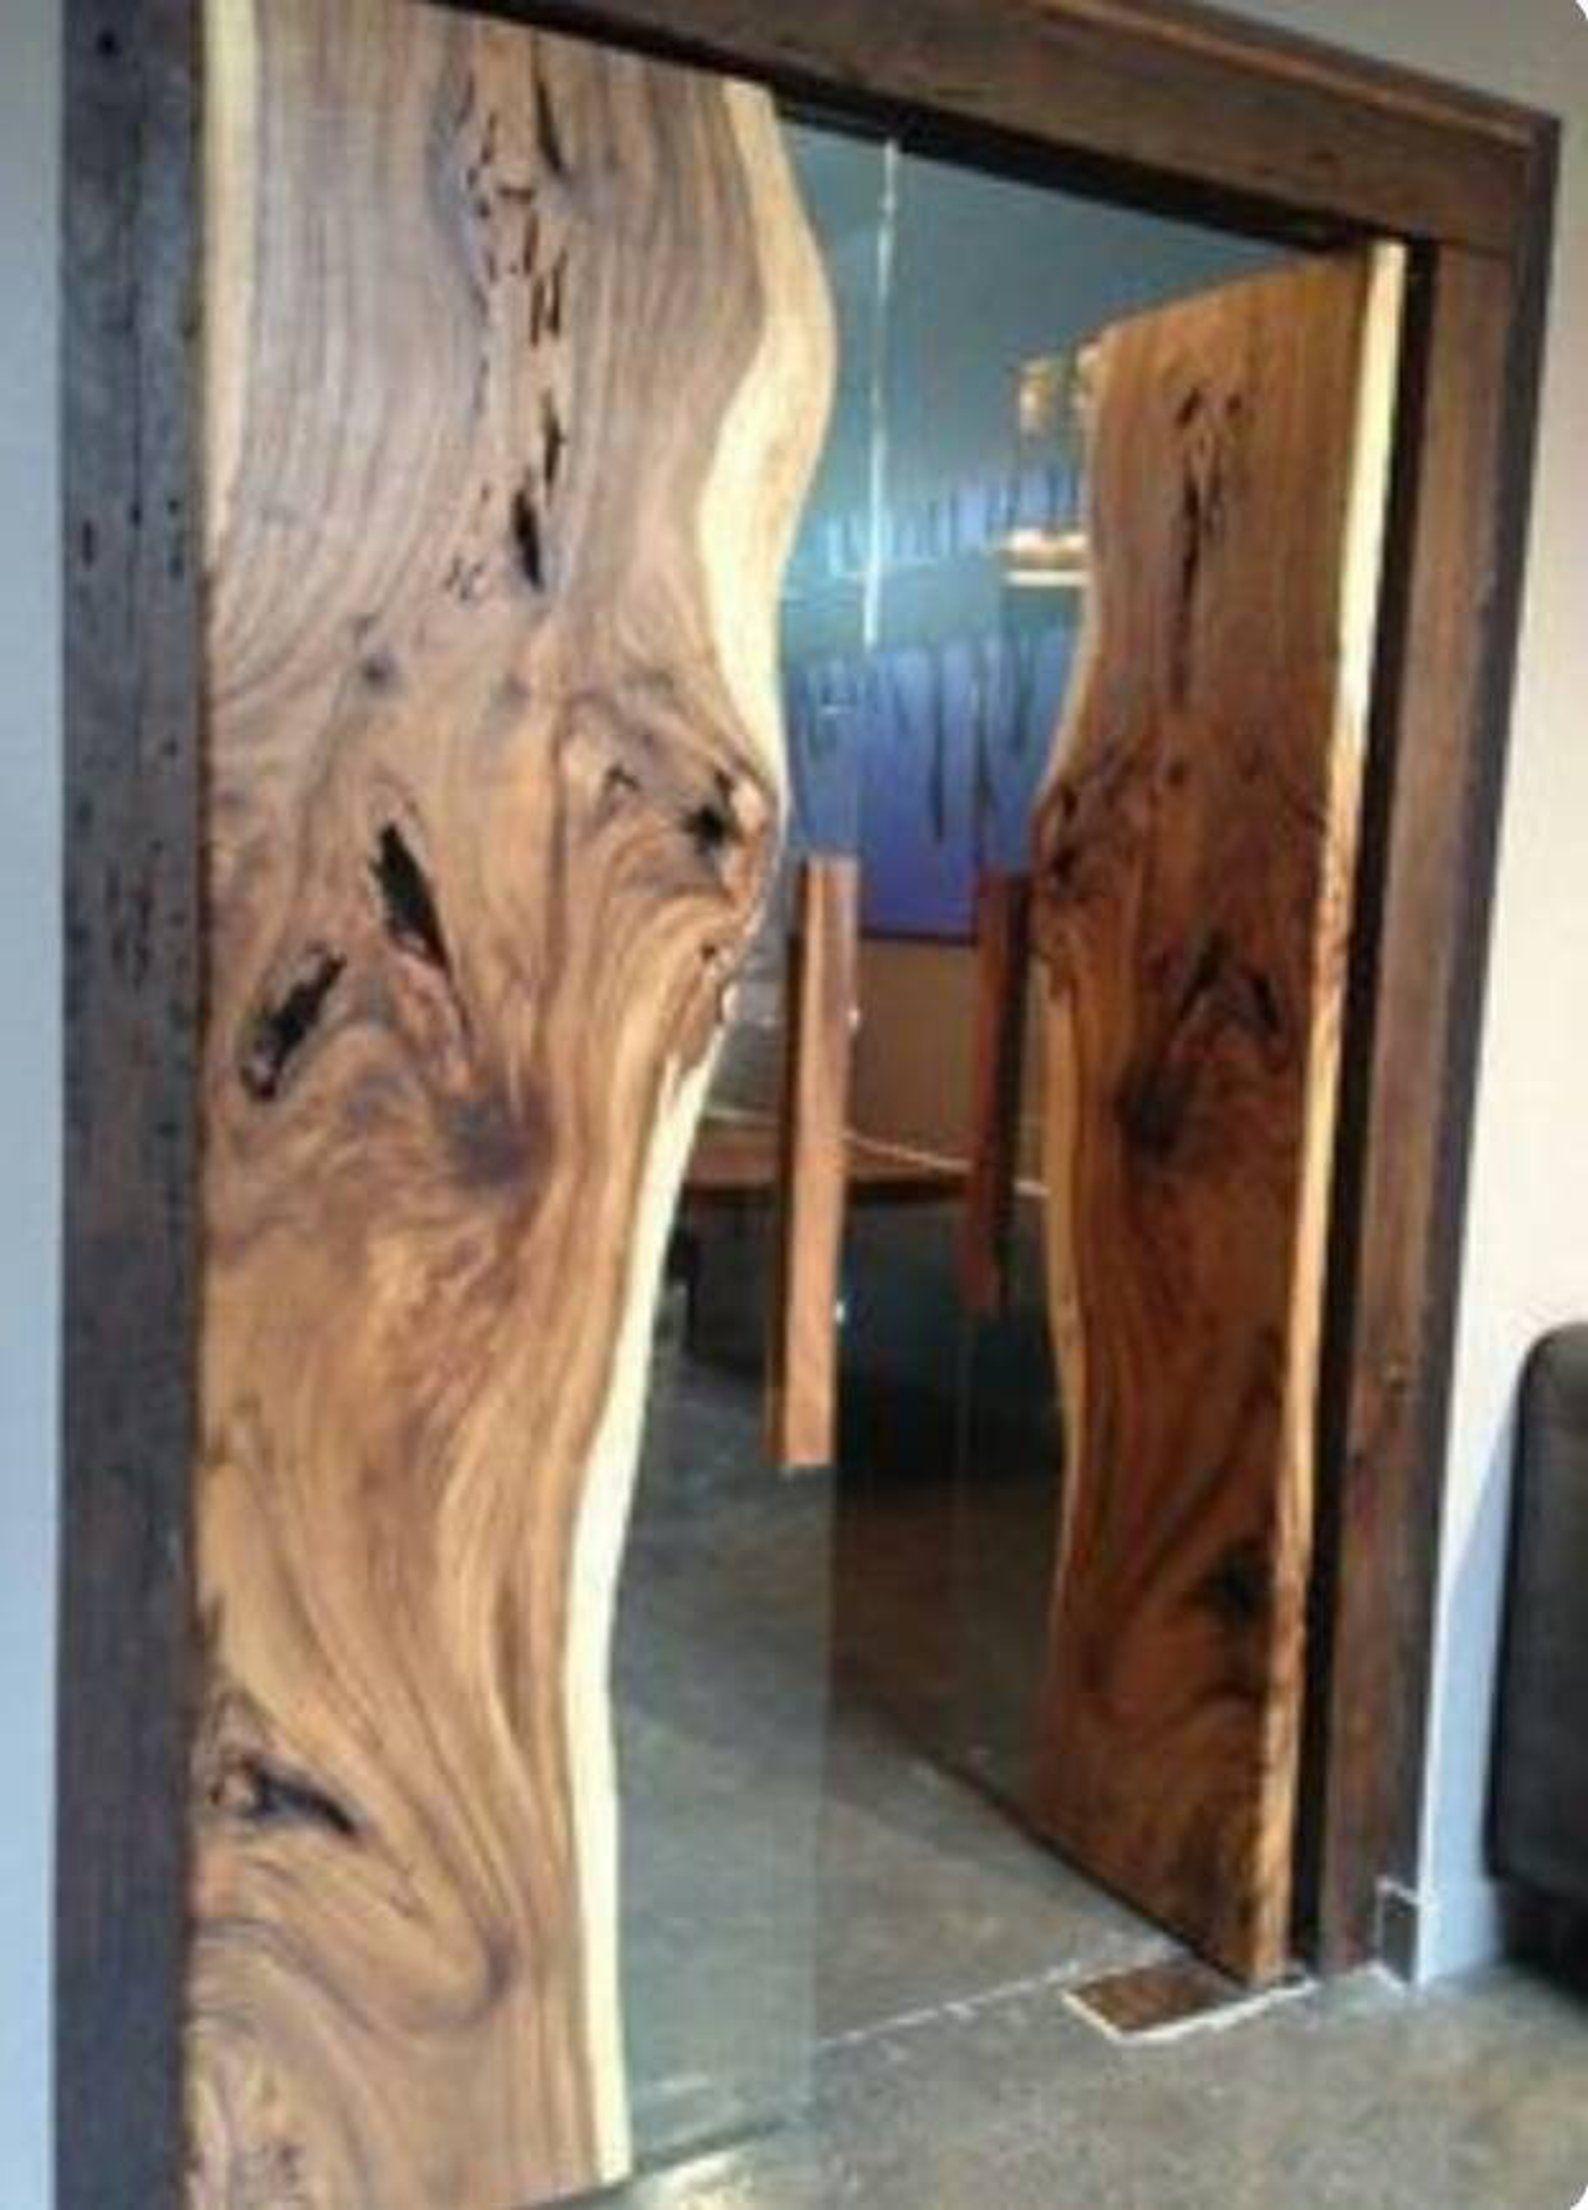 Porte Epoxy Porte En Resine Porte Recalmed Faite Sur Mesure Etsy Wood Doors Interior Wood Doors Wood Slab